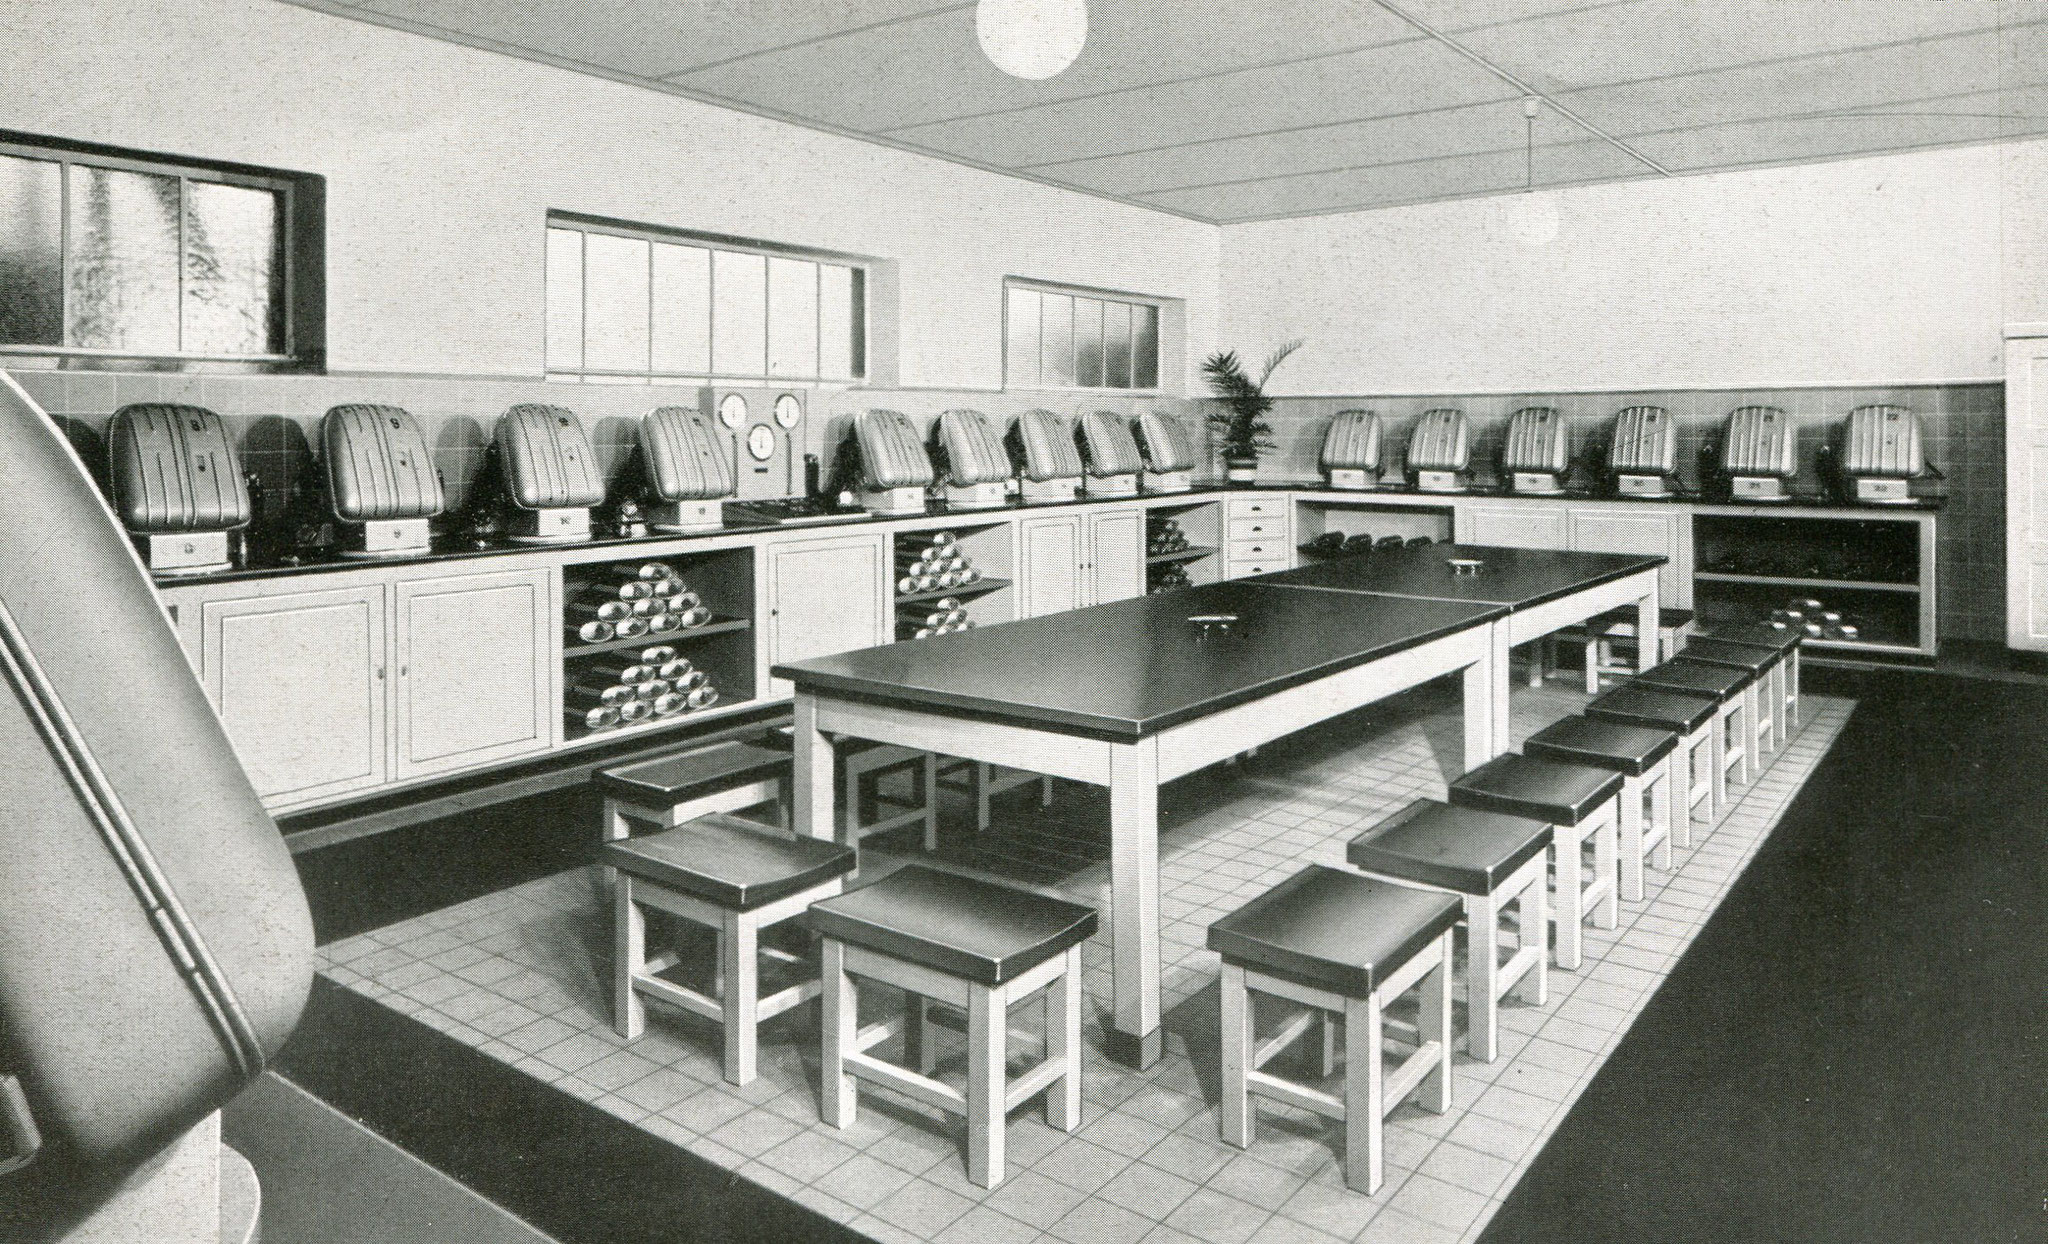 Grubenrettungsstelle Hannover-Hannibal in Bochum  1936